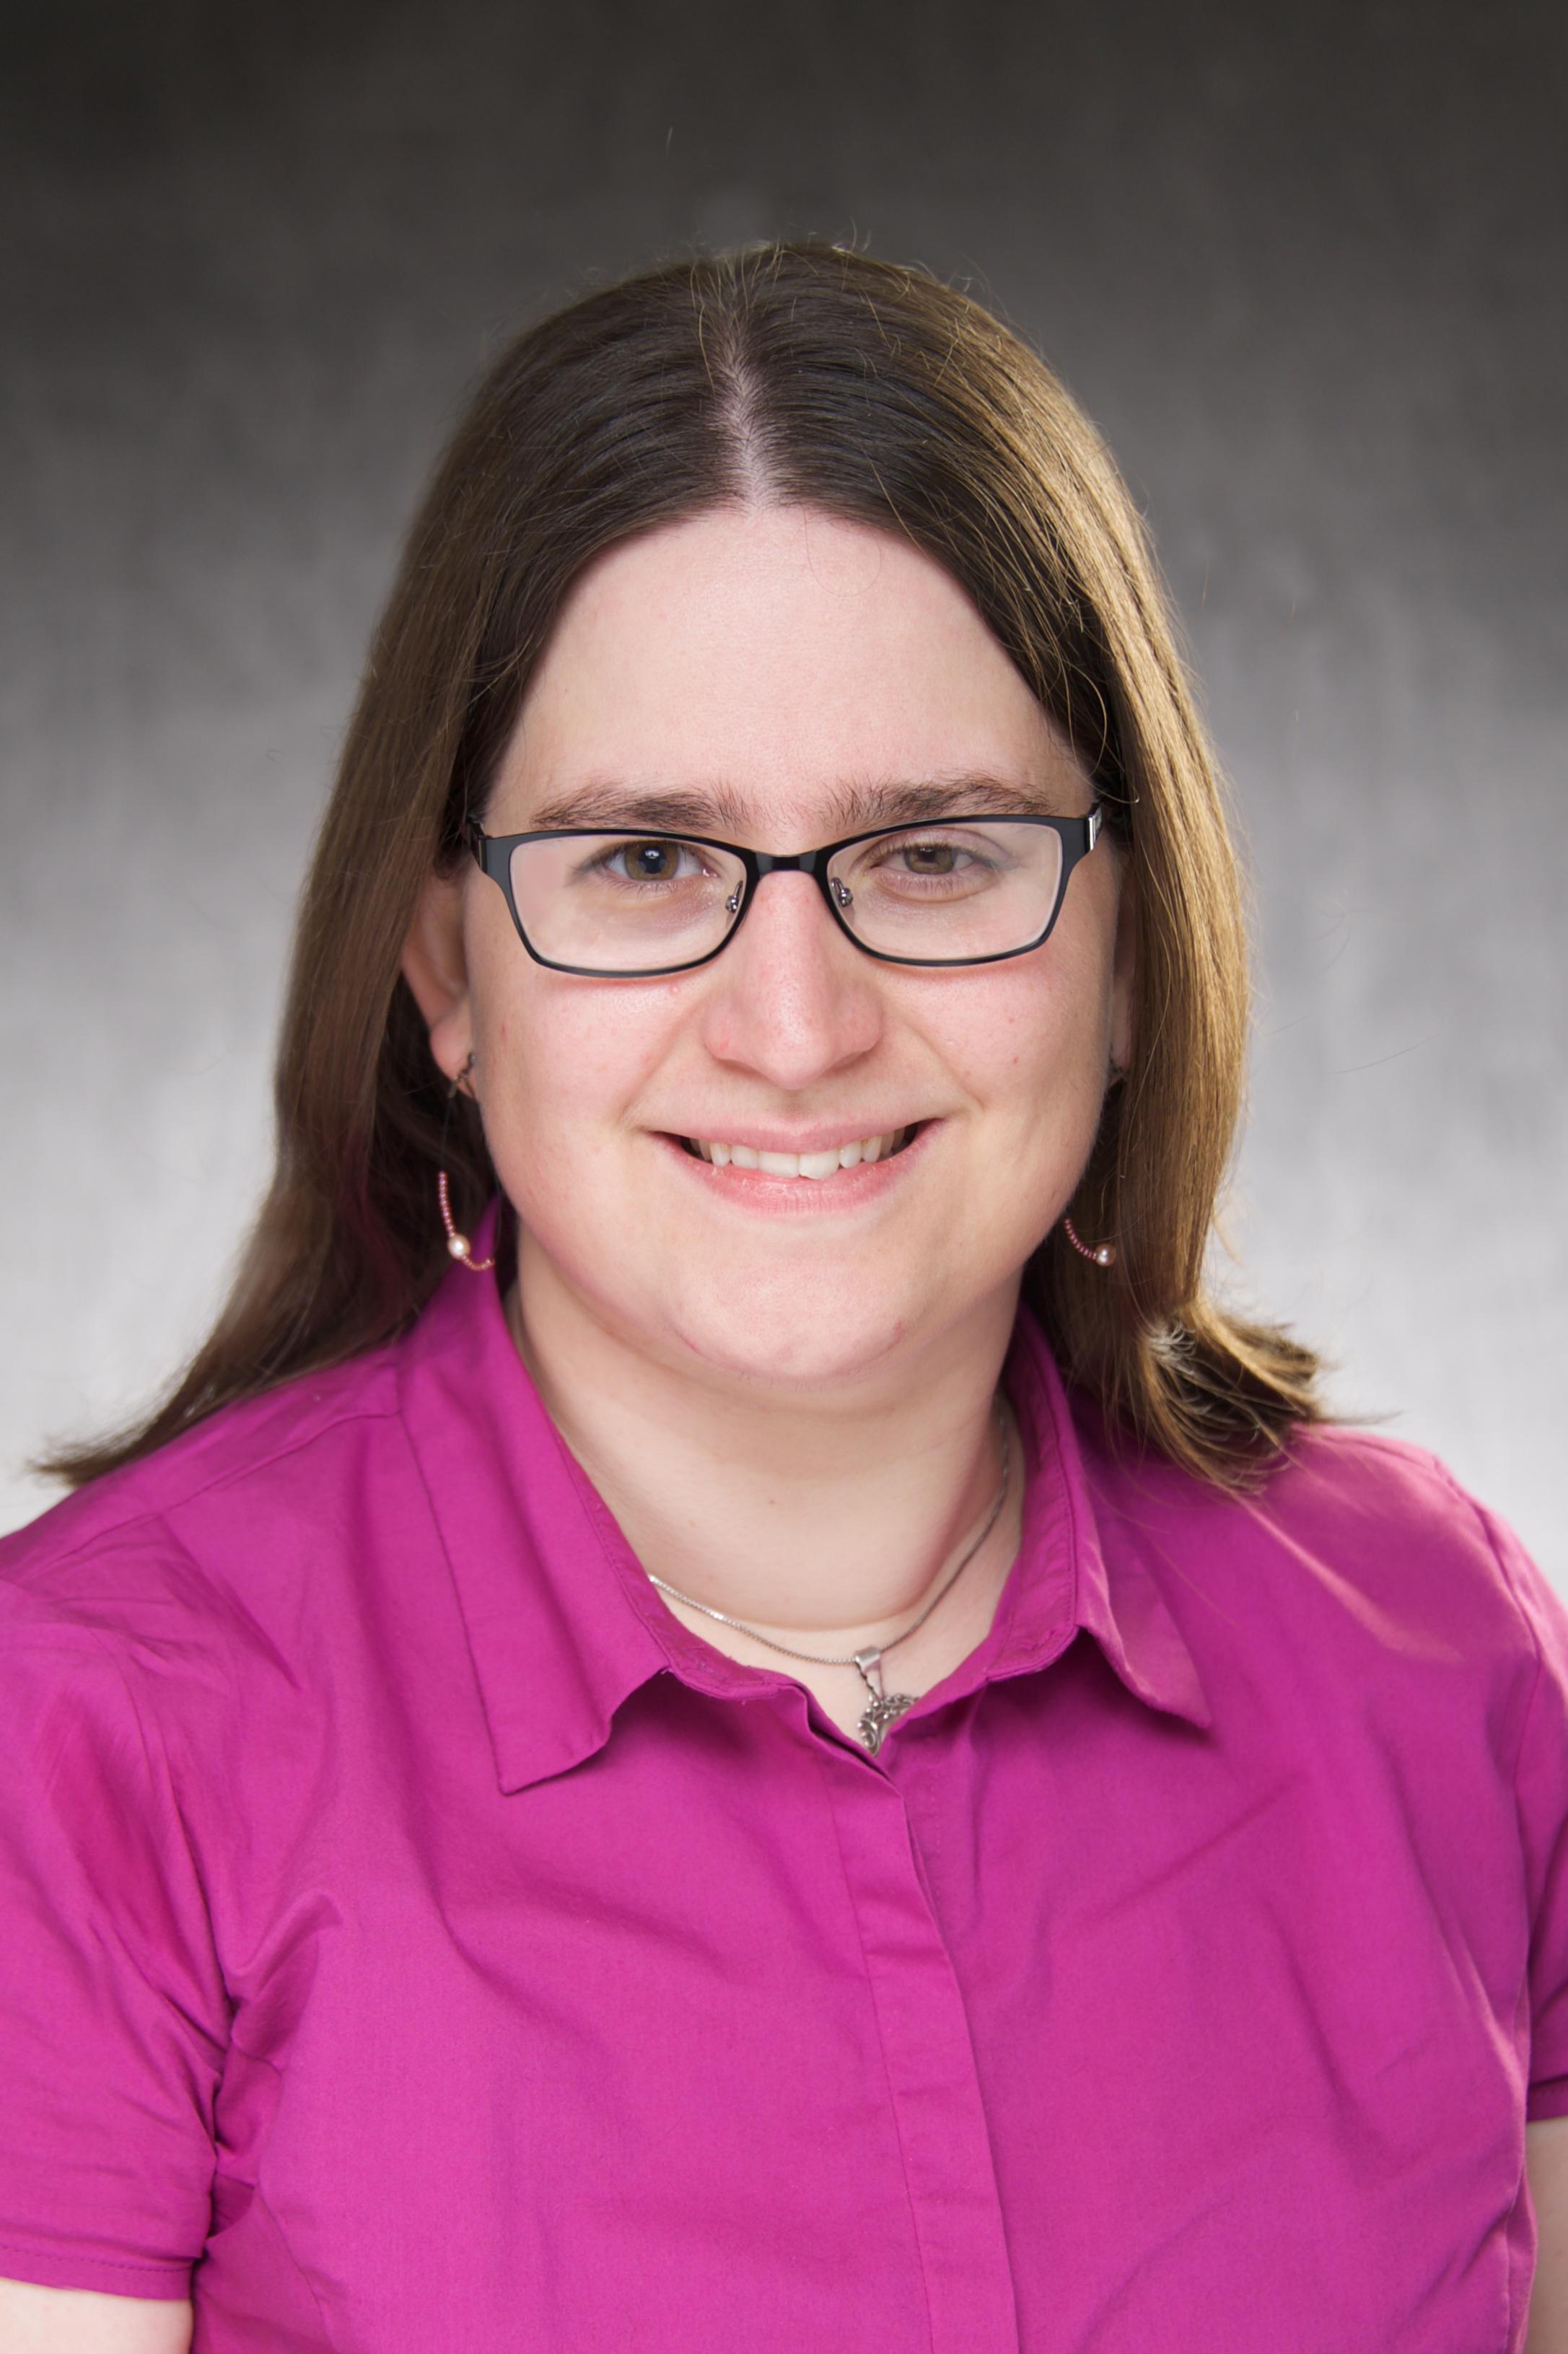 Tracey Morgan-Harris, MD